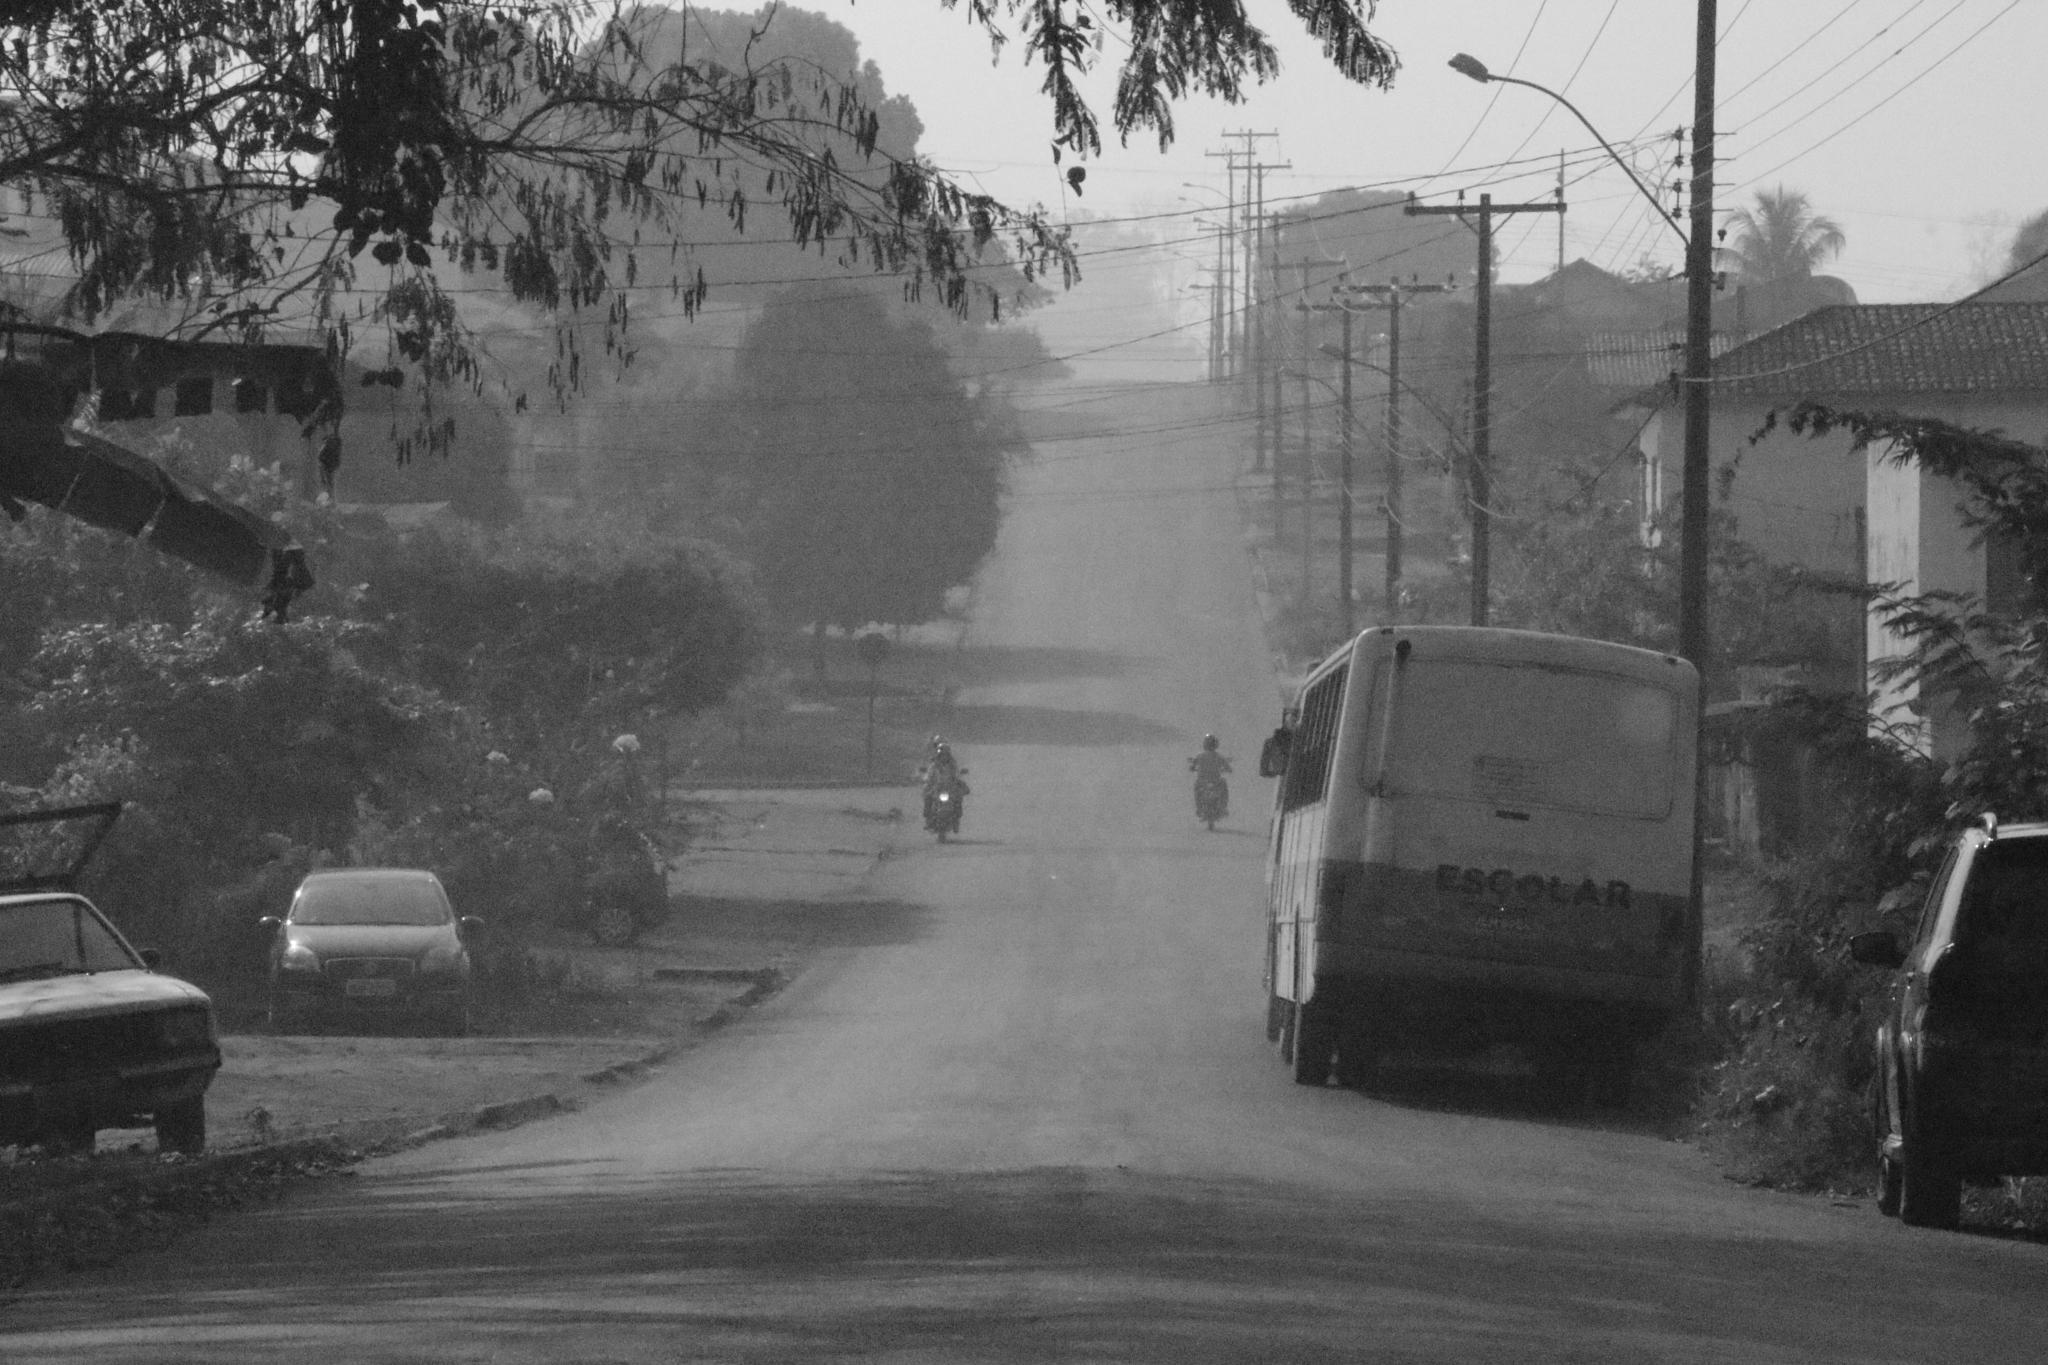 Childwood memory by marceloazevedo1972